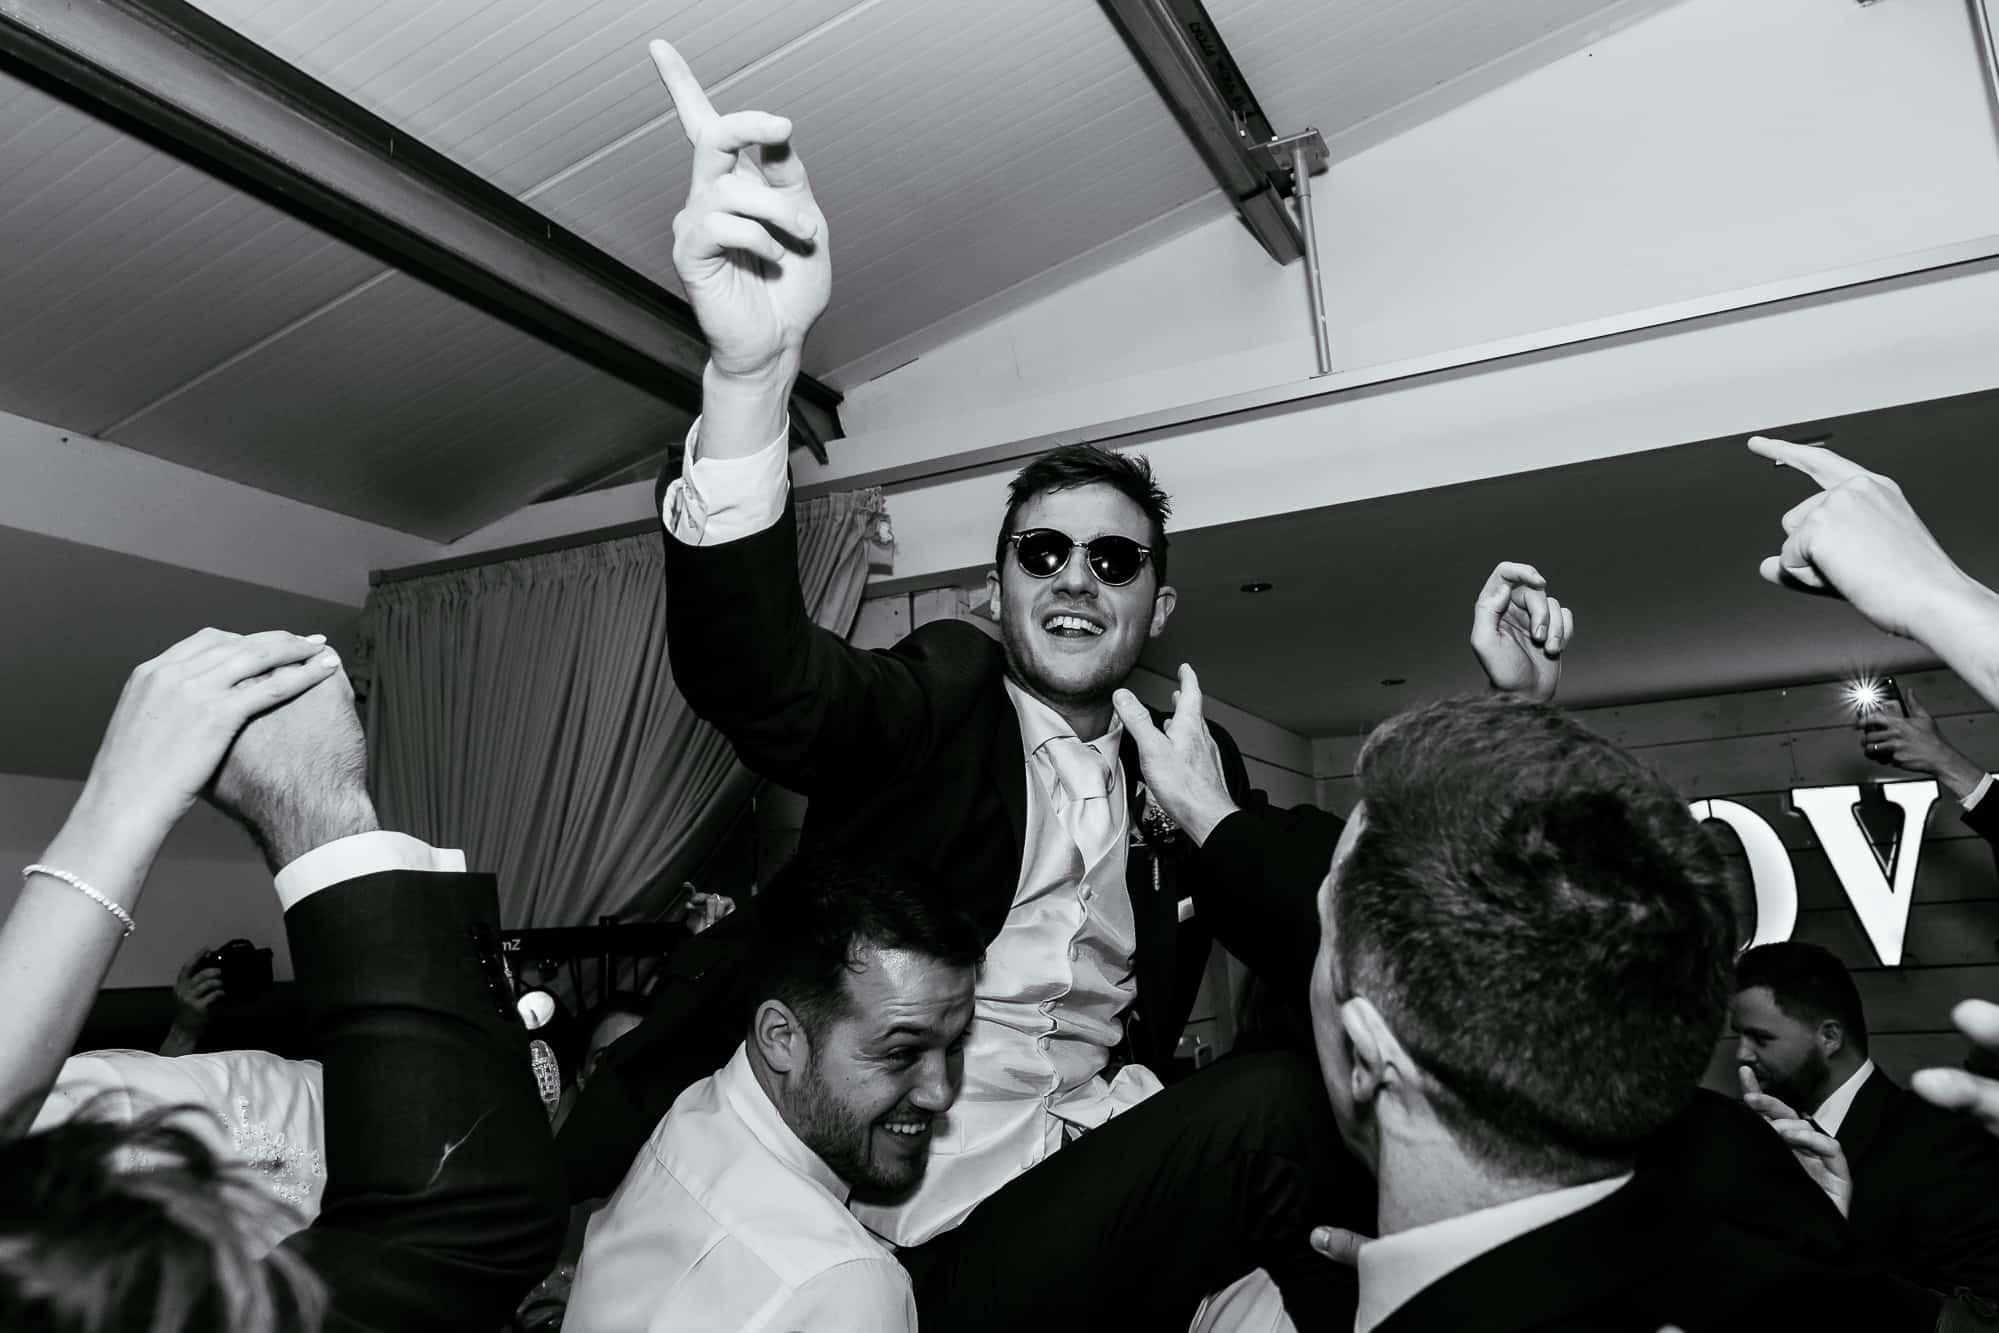 Groom on the dance floor on guests shoulders